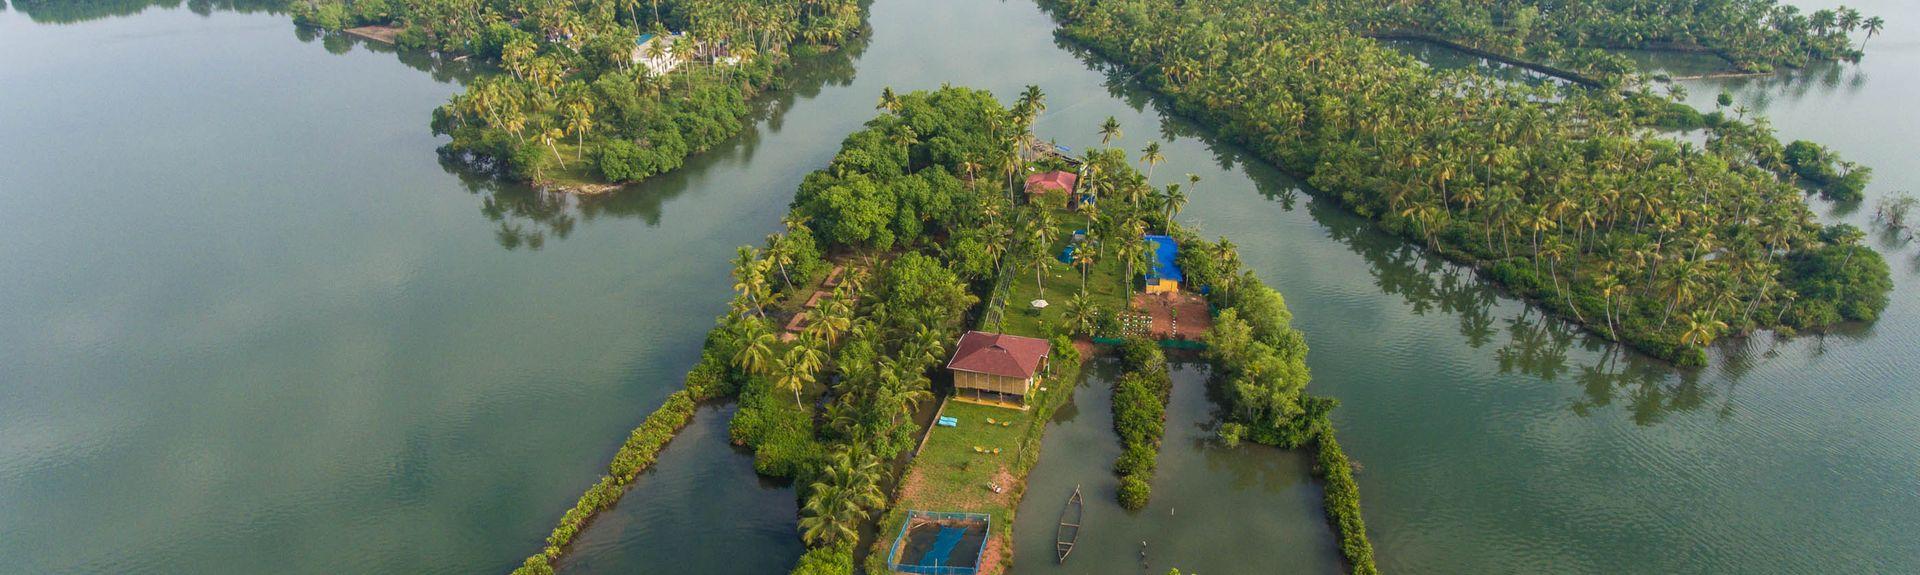 Kollam District, India